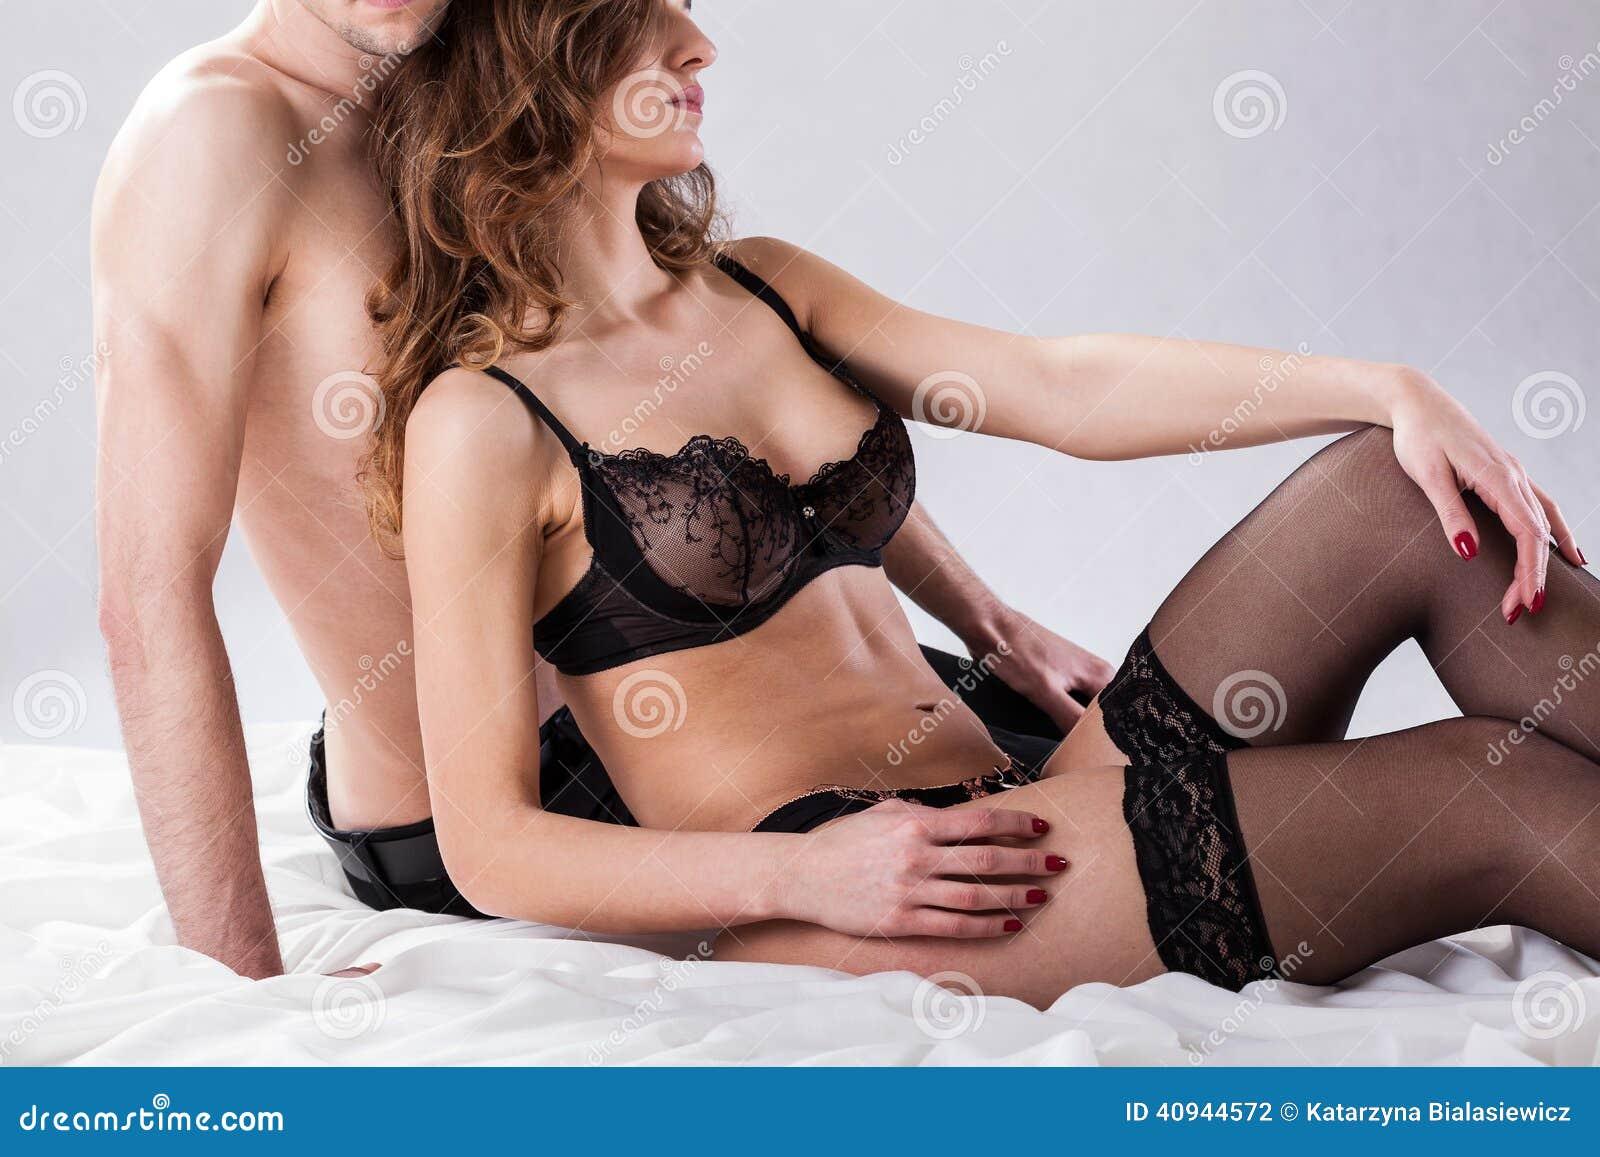 thaimassage he sex och samlag